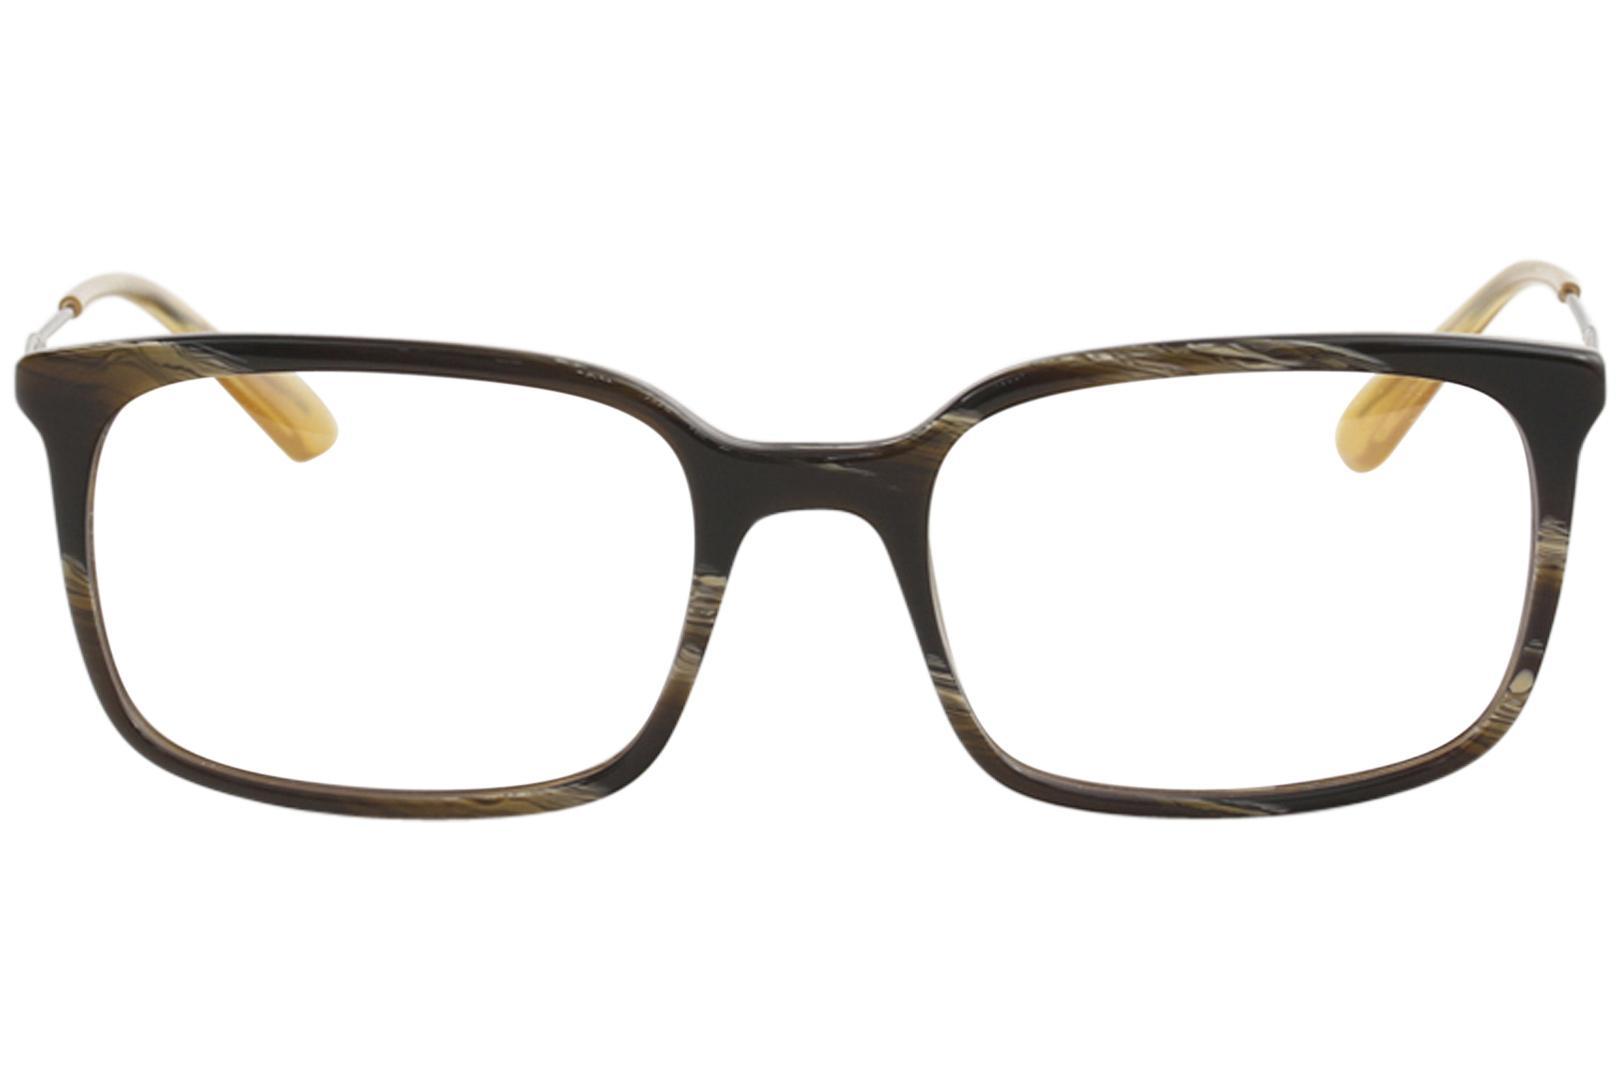 8b843f2242d Prada Men s Eyeglasses VPR16U VPR 16U Full Rim Optical Frame by Prada. 12345